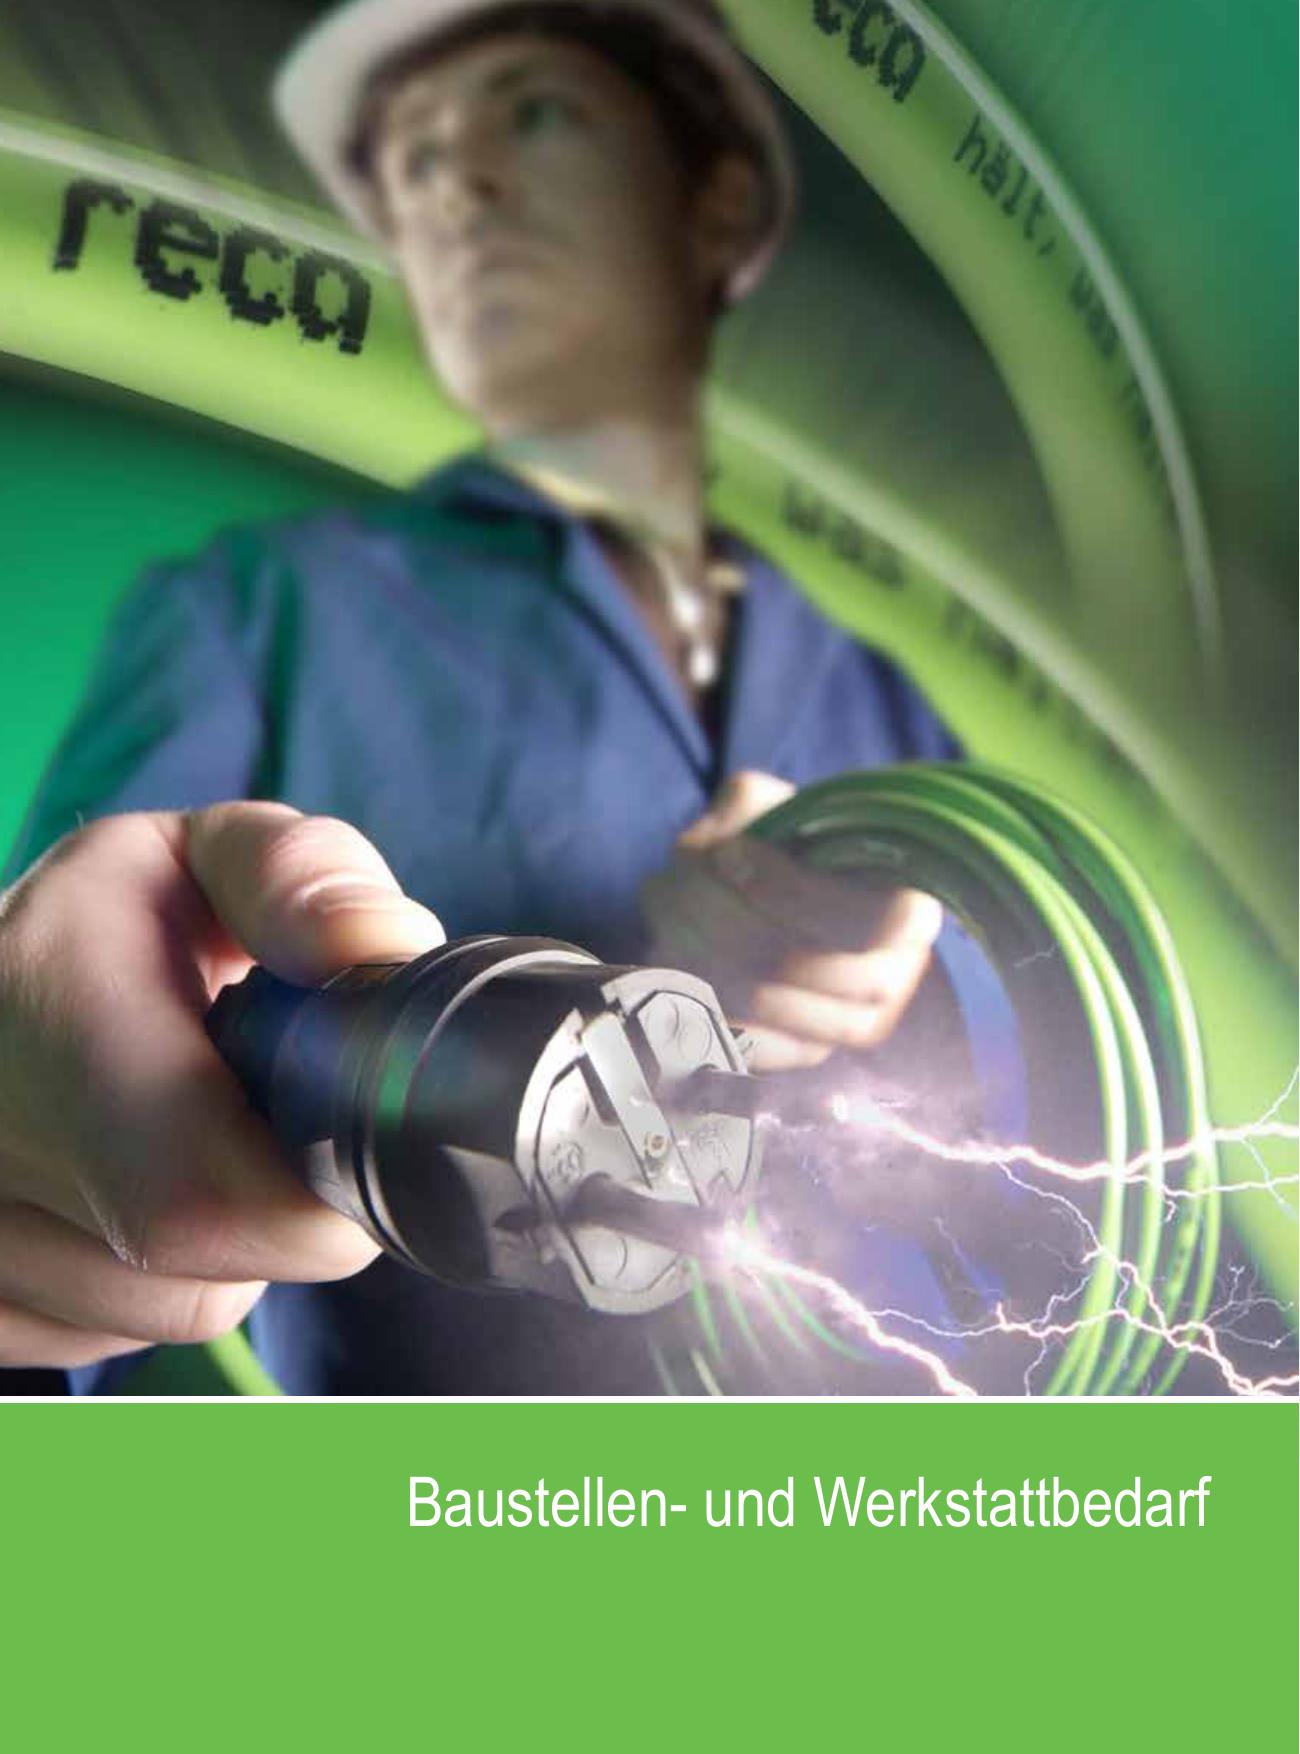 Heimwerker Neue Mode 22mm O/d 304 Edelstahl Sanitär Weld T Anschluss Rohr Fitting ZuverläSsige Leistung Rohrverbindungsstücke